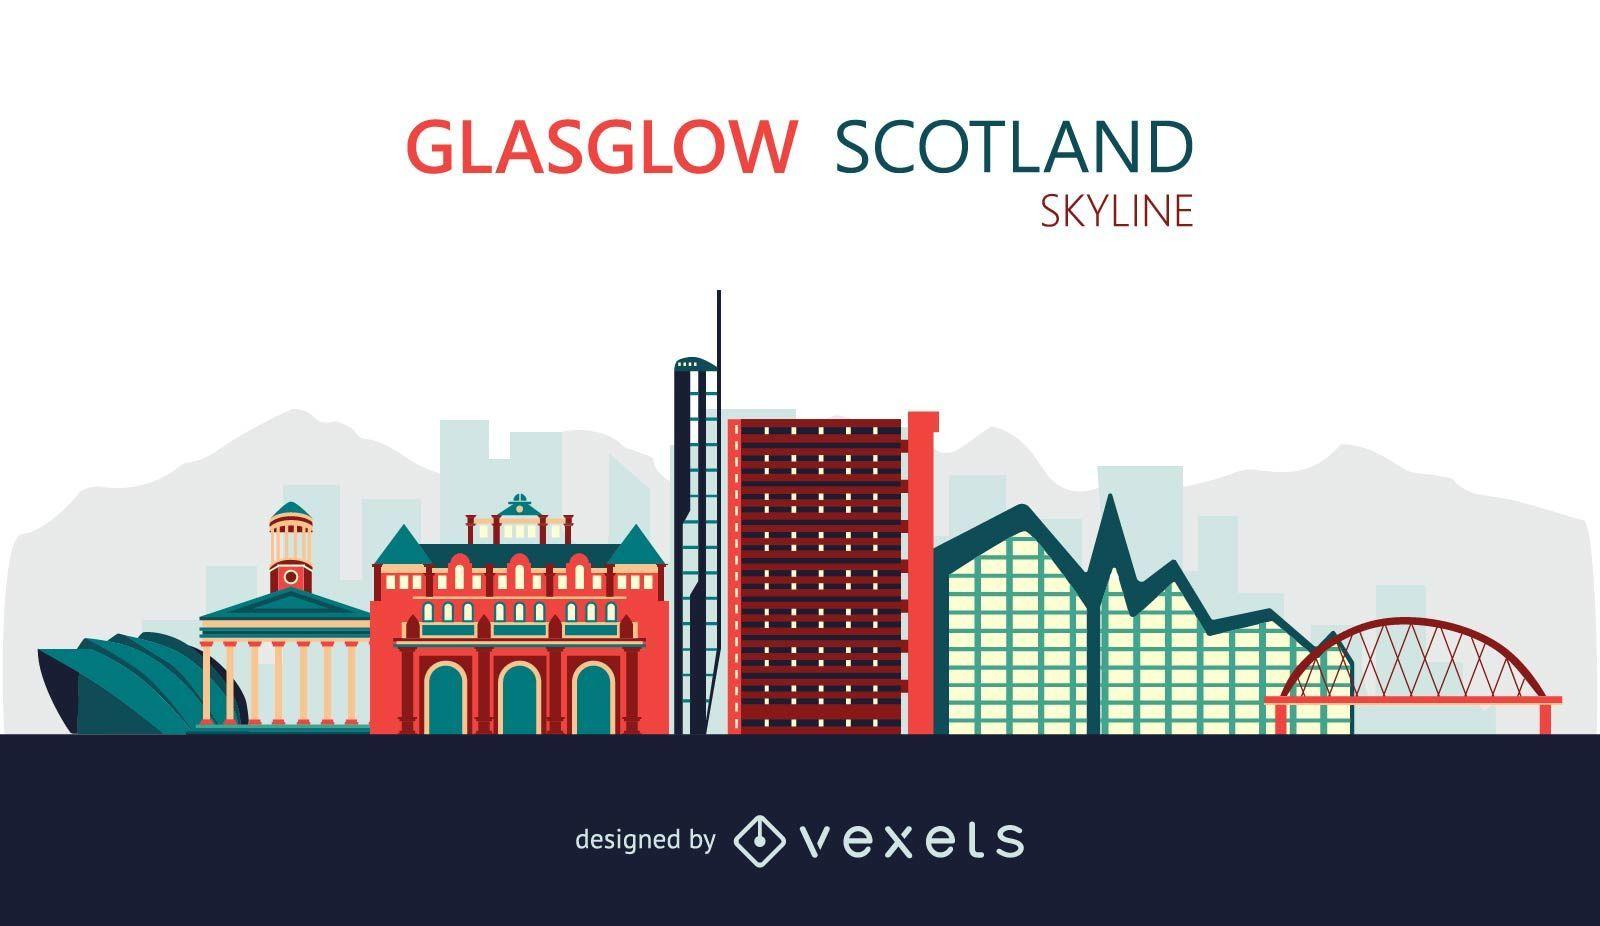 Flat Glasgow skyline illustration